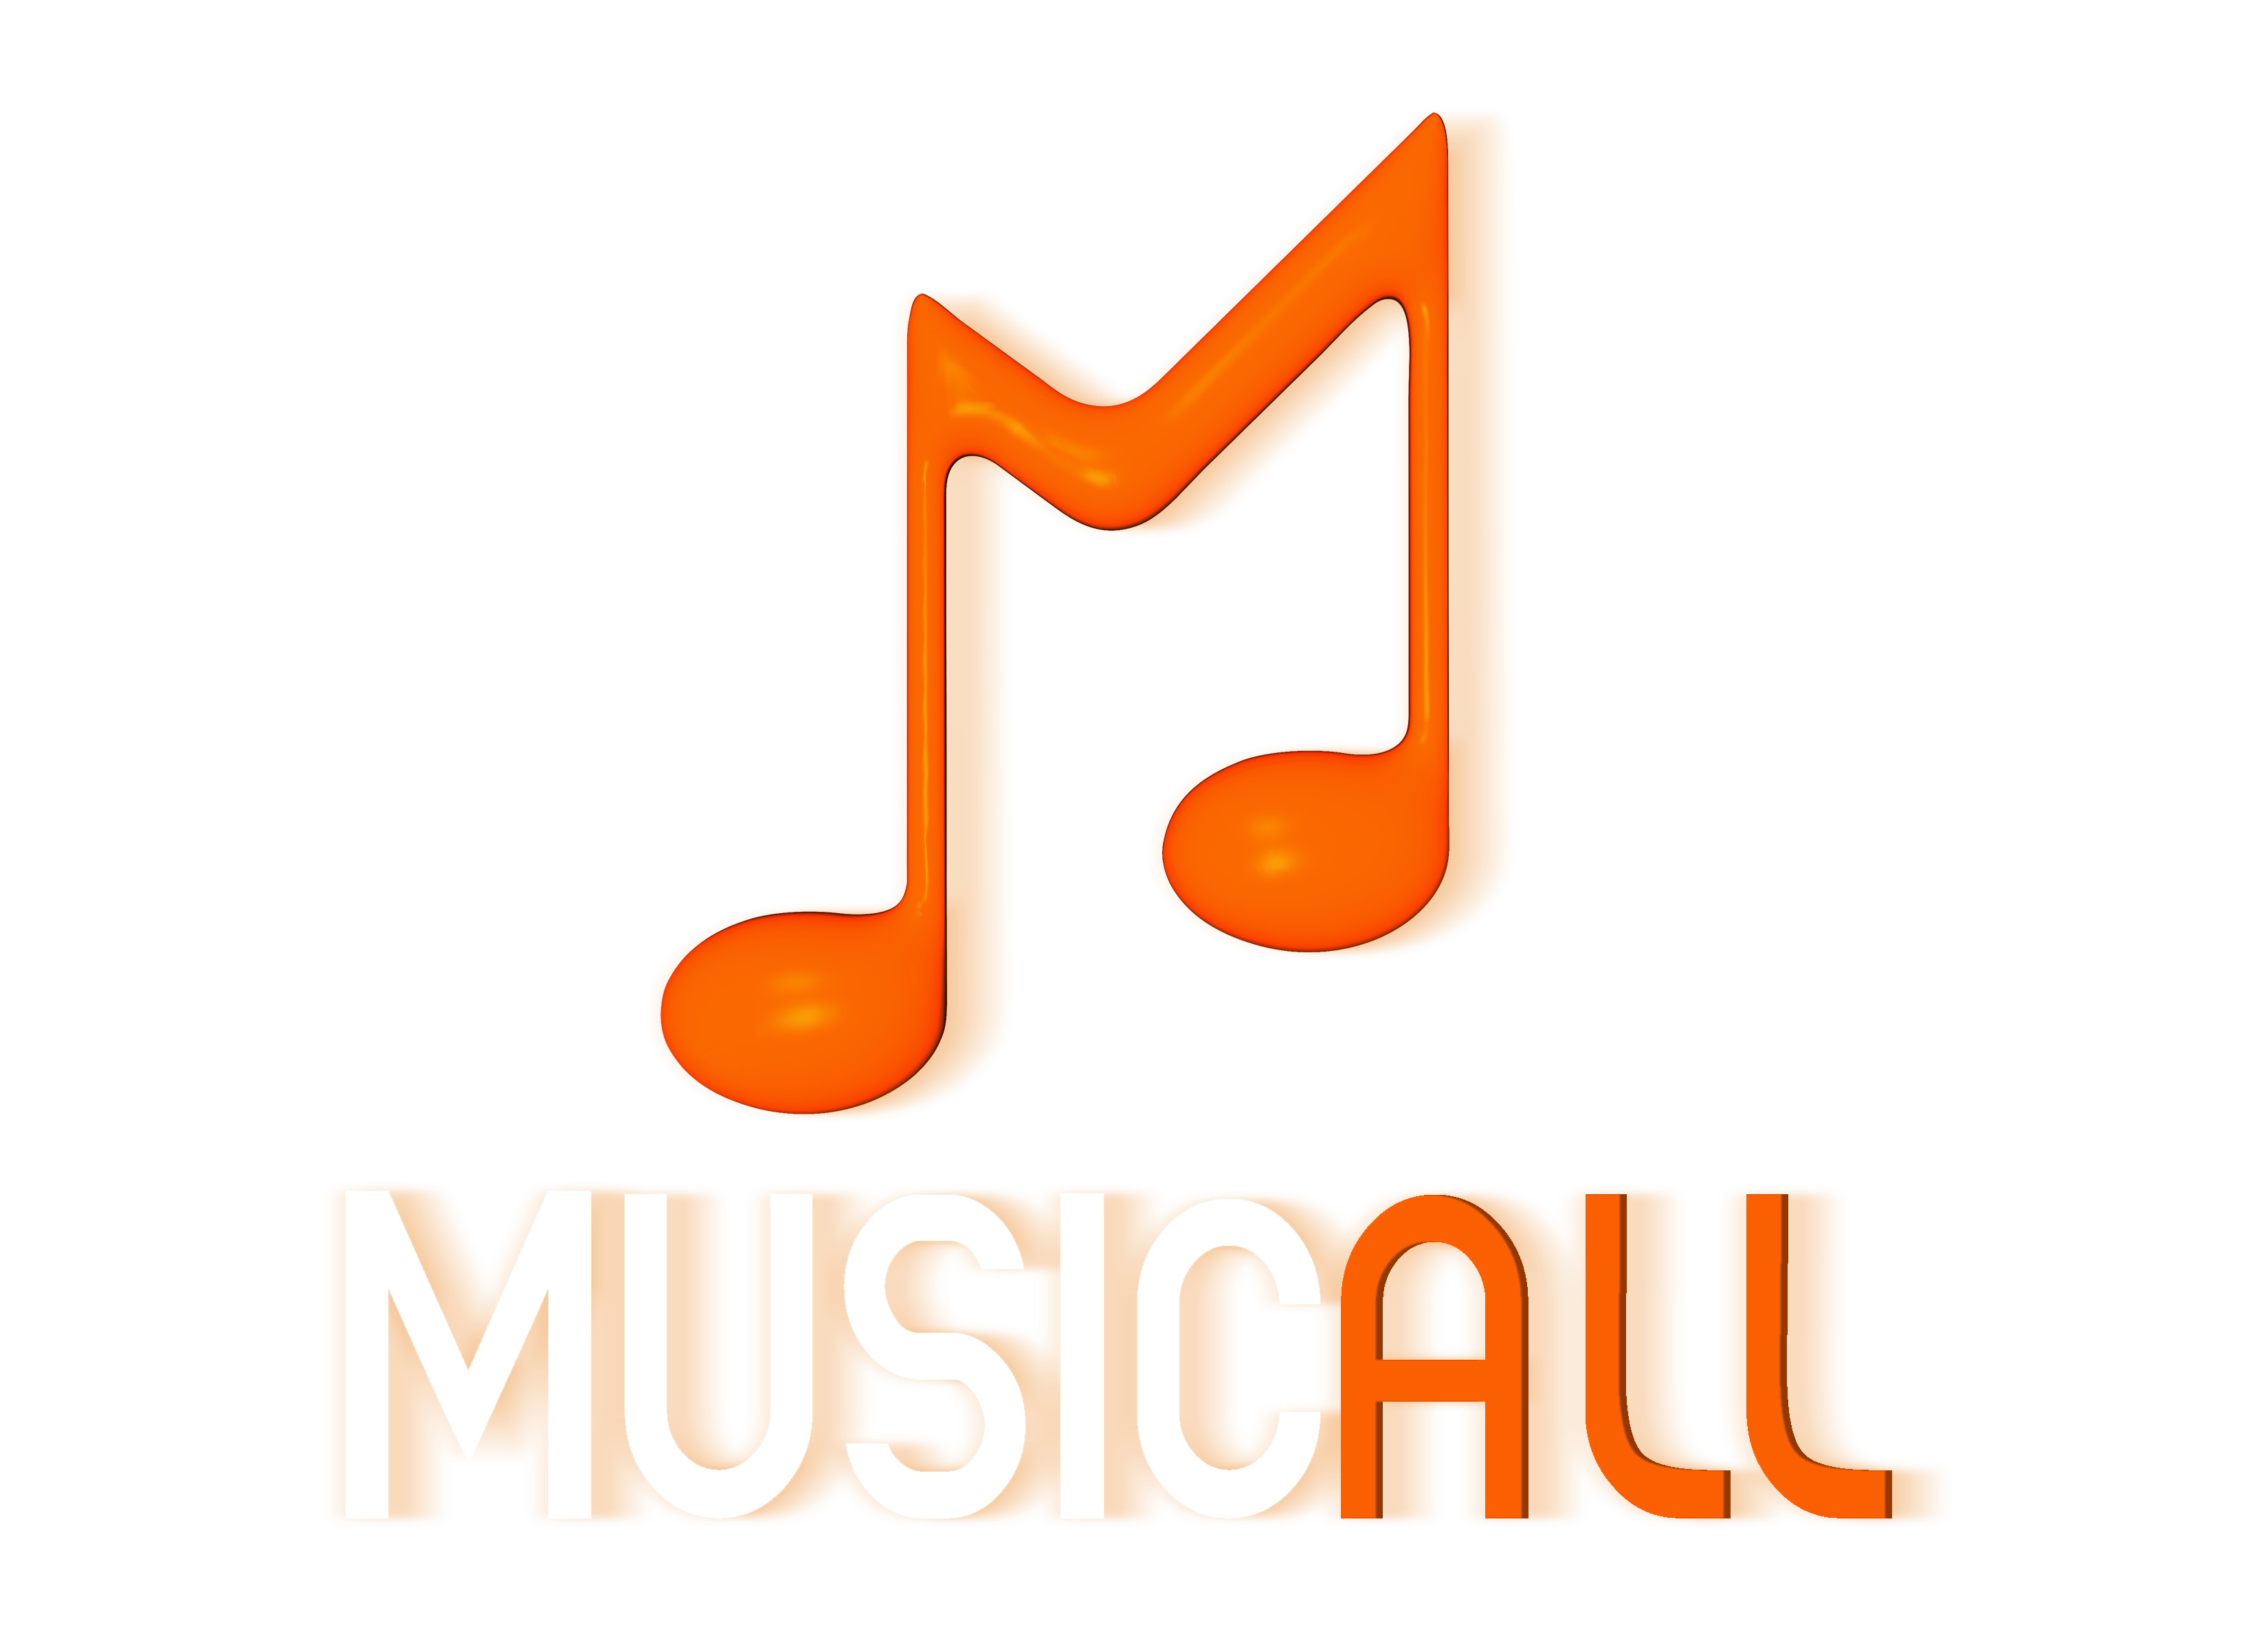 Musicall Inc.